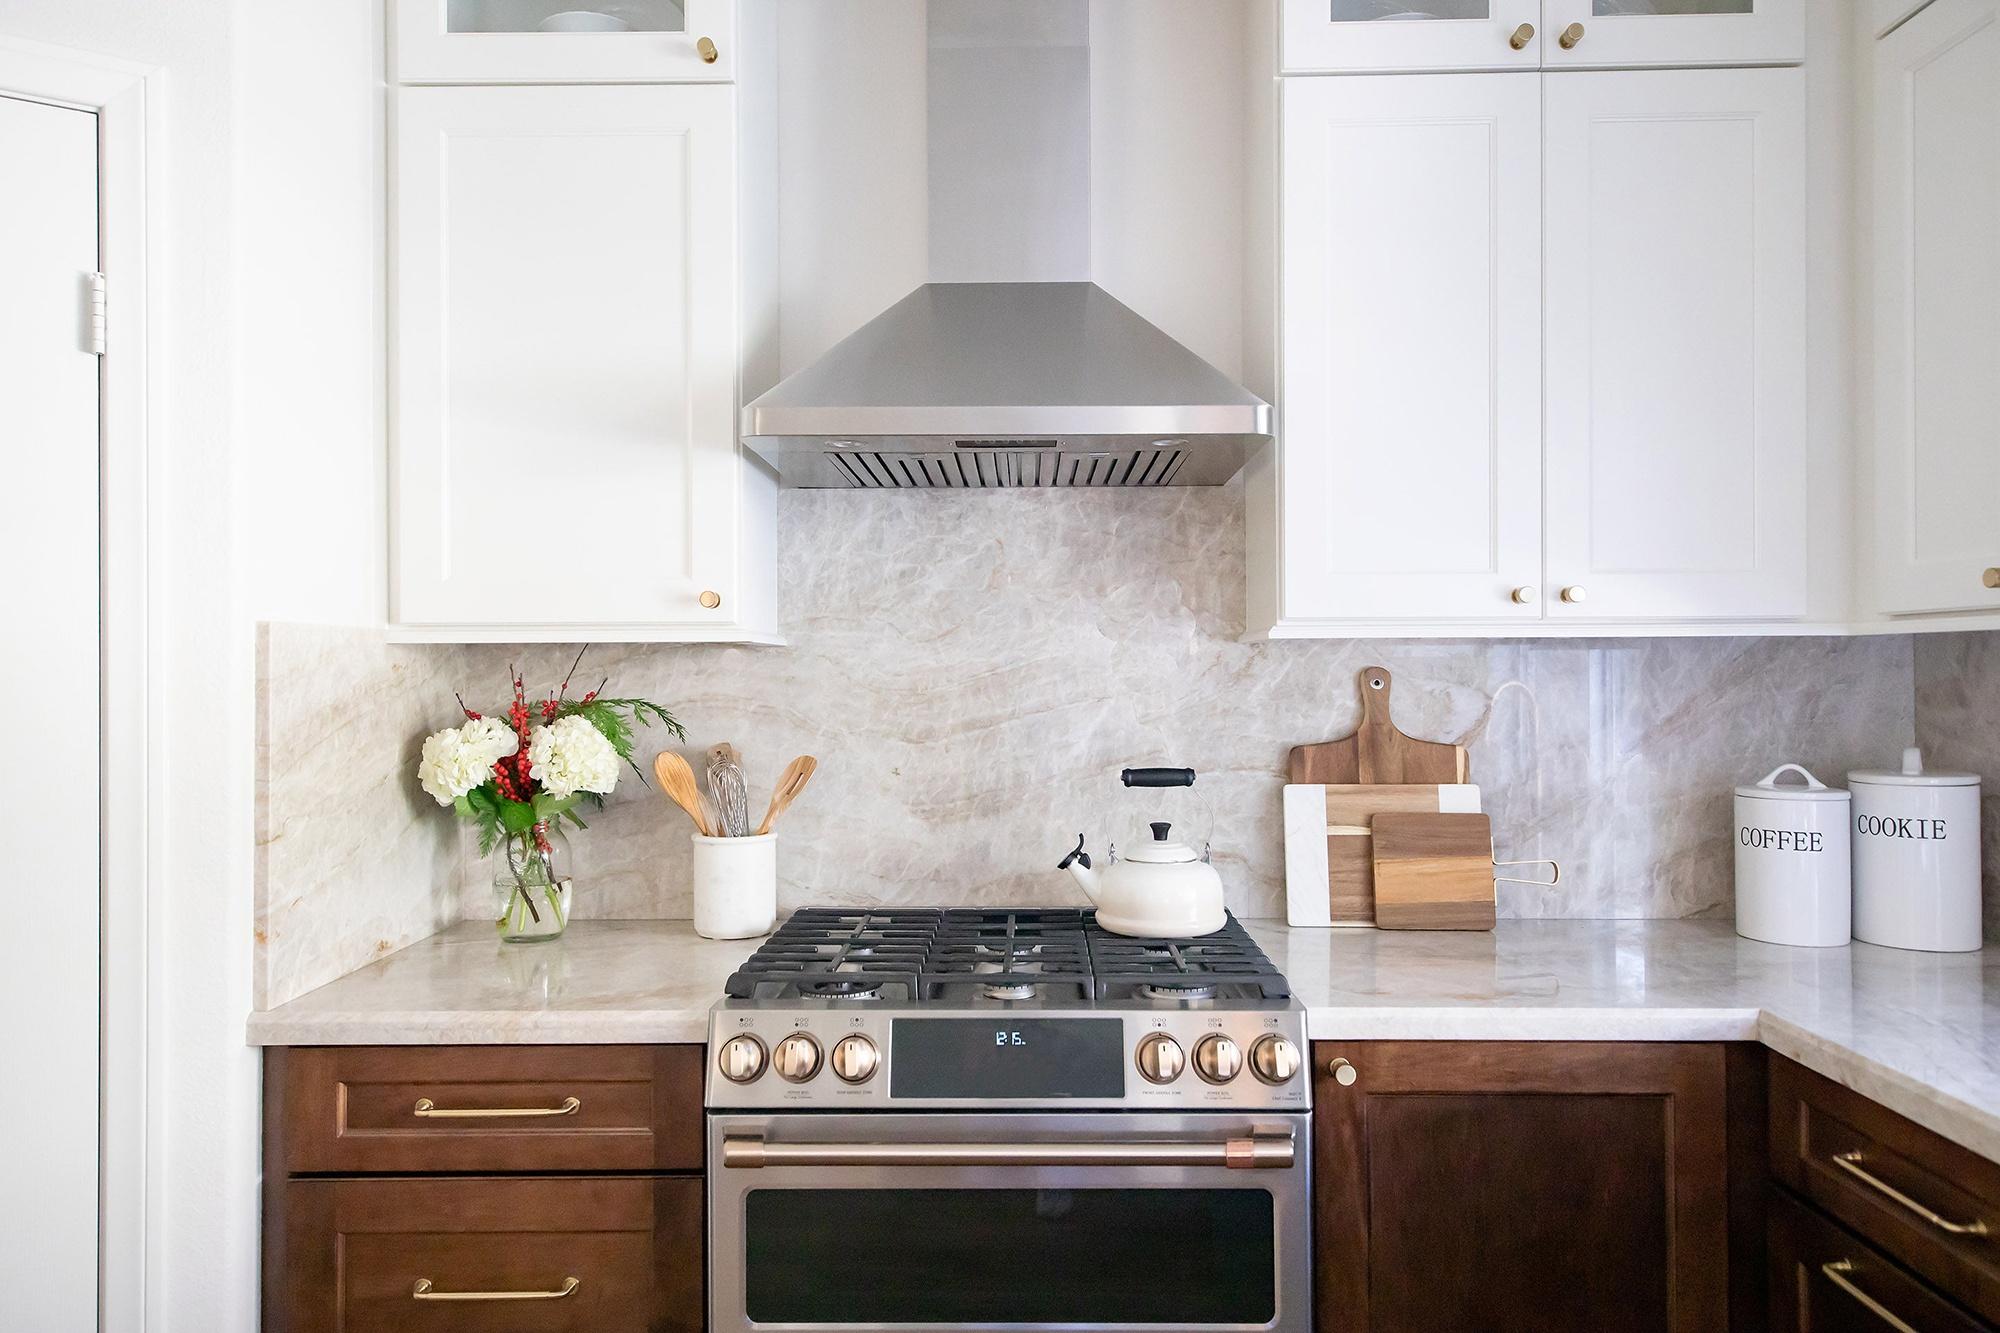 The 9 Best Timeless Kitchen Design Ideas of 9